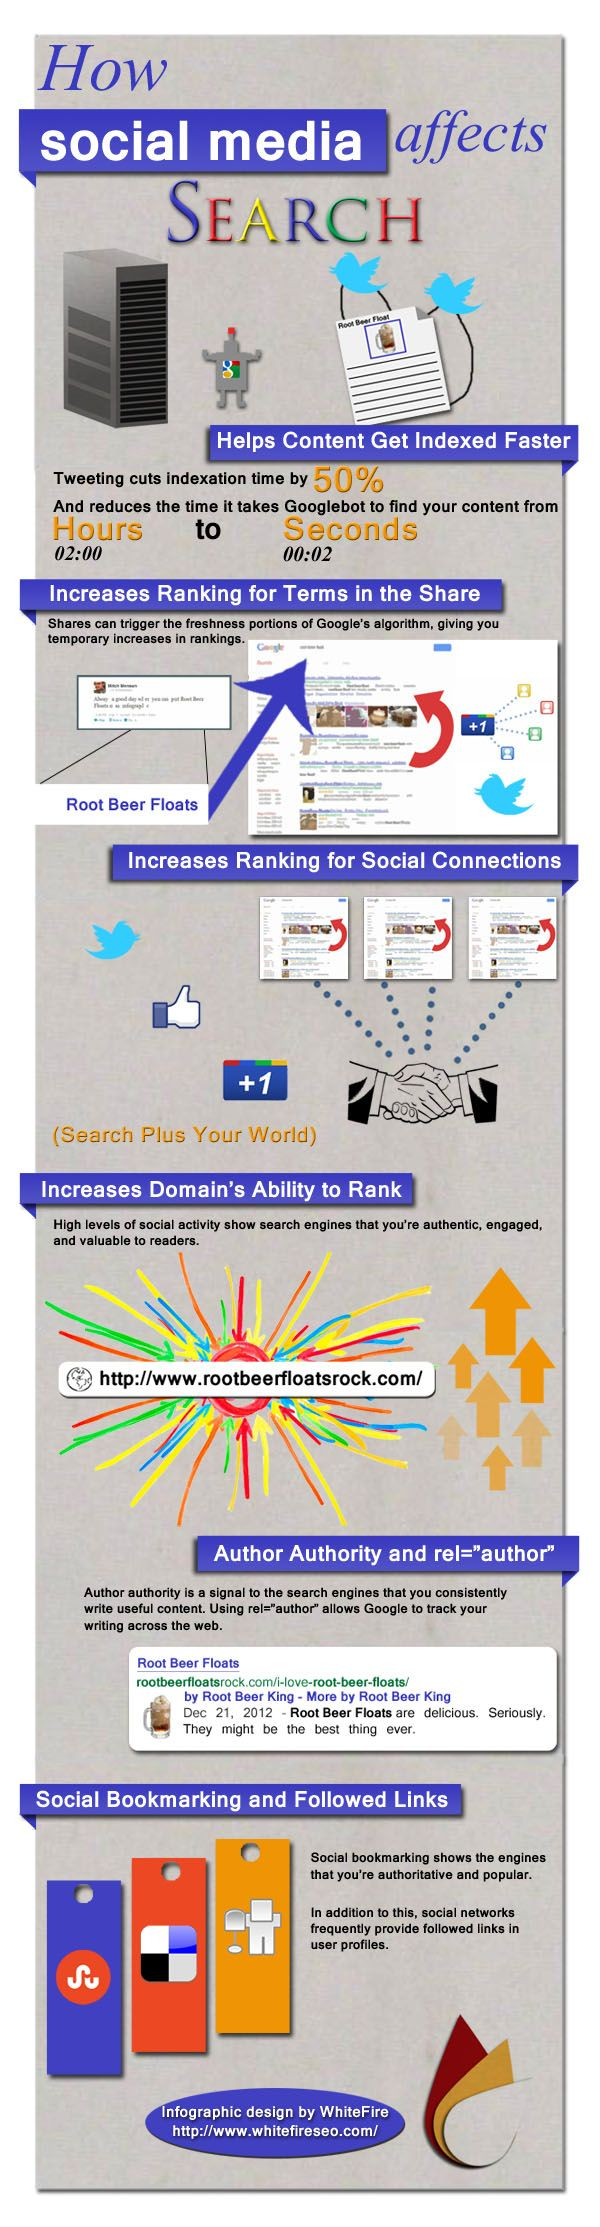 How Social Media Impacts SEO [INFOGRAPHIC] | Social Media Today